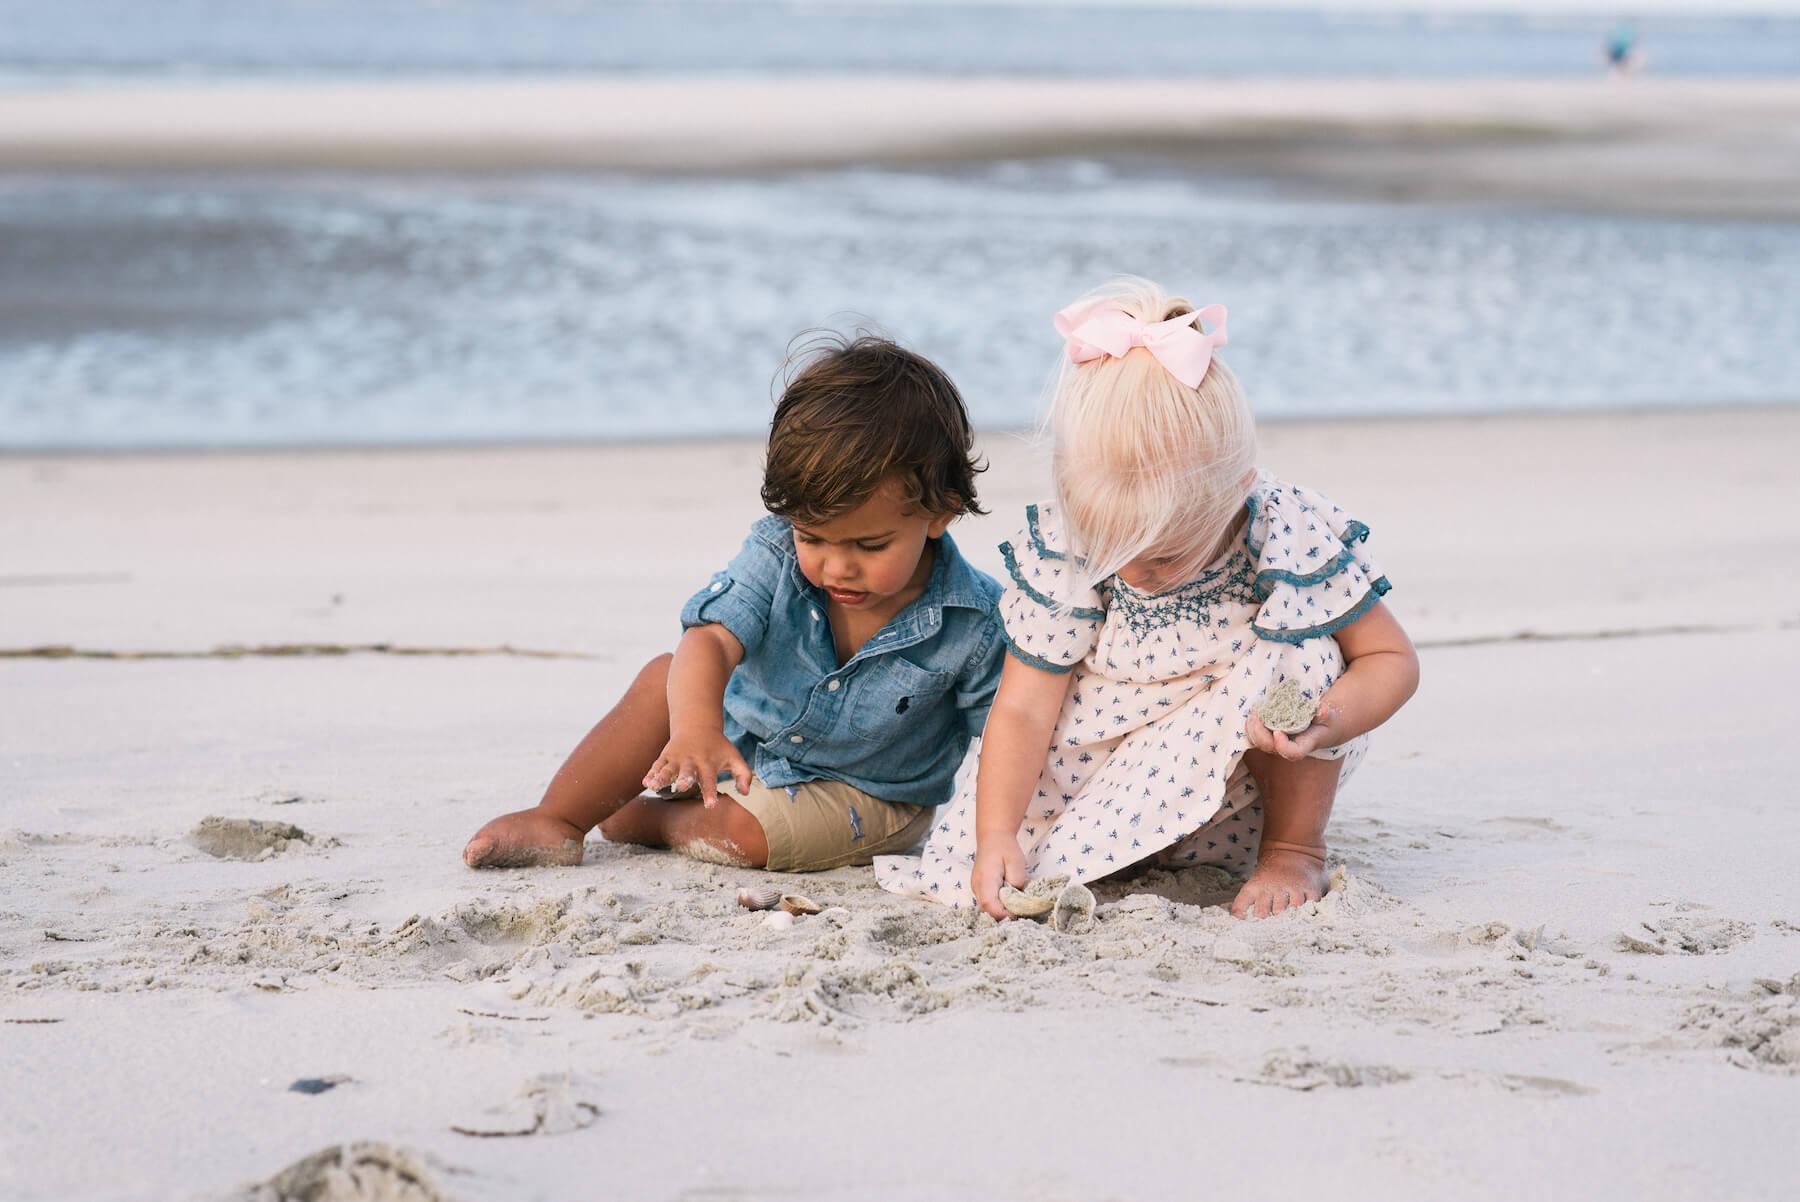 kids playing on the beach Savannah, Georgia, United States of America